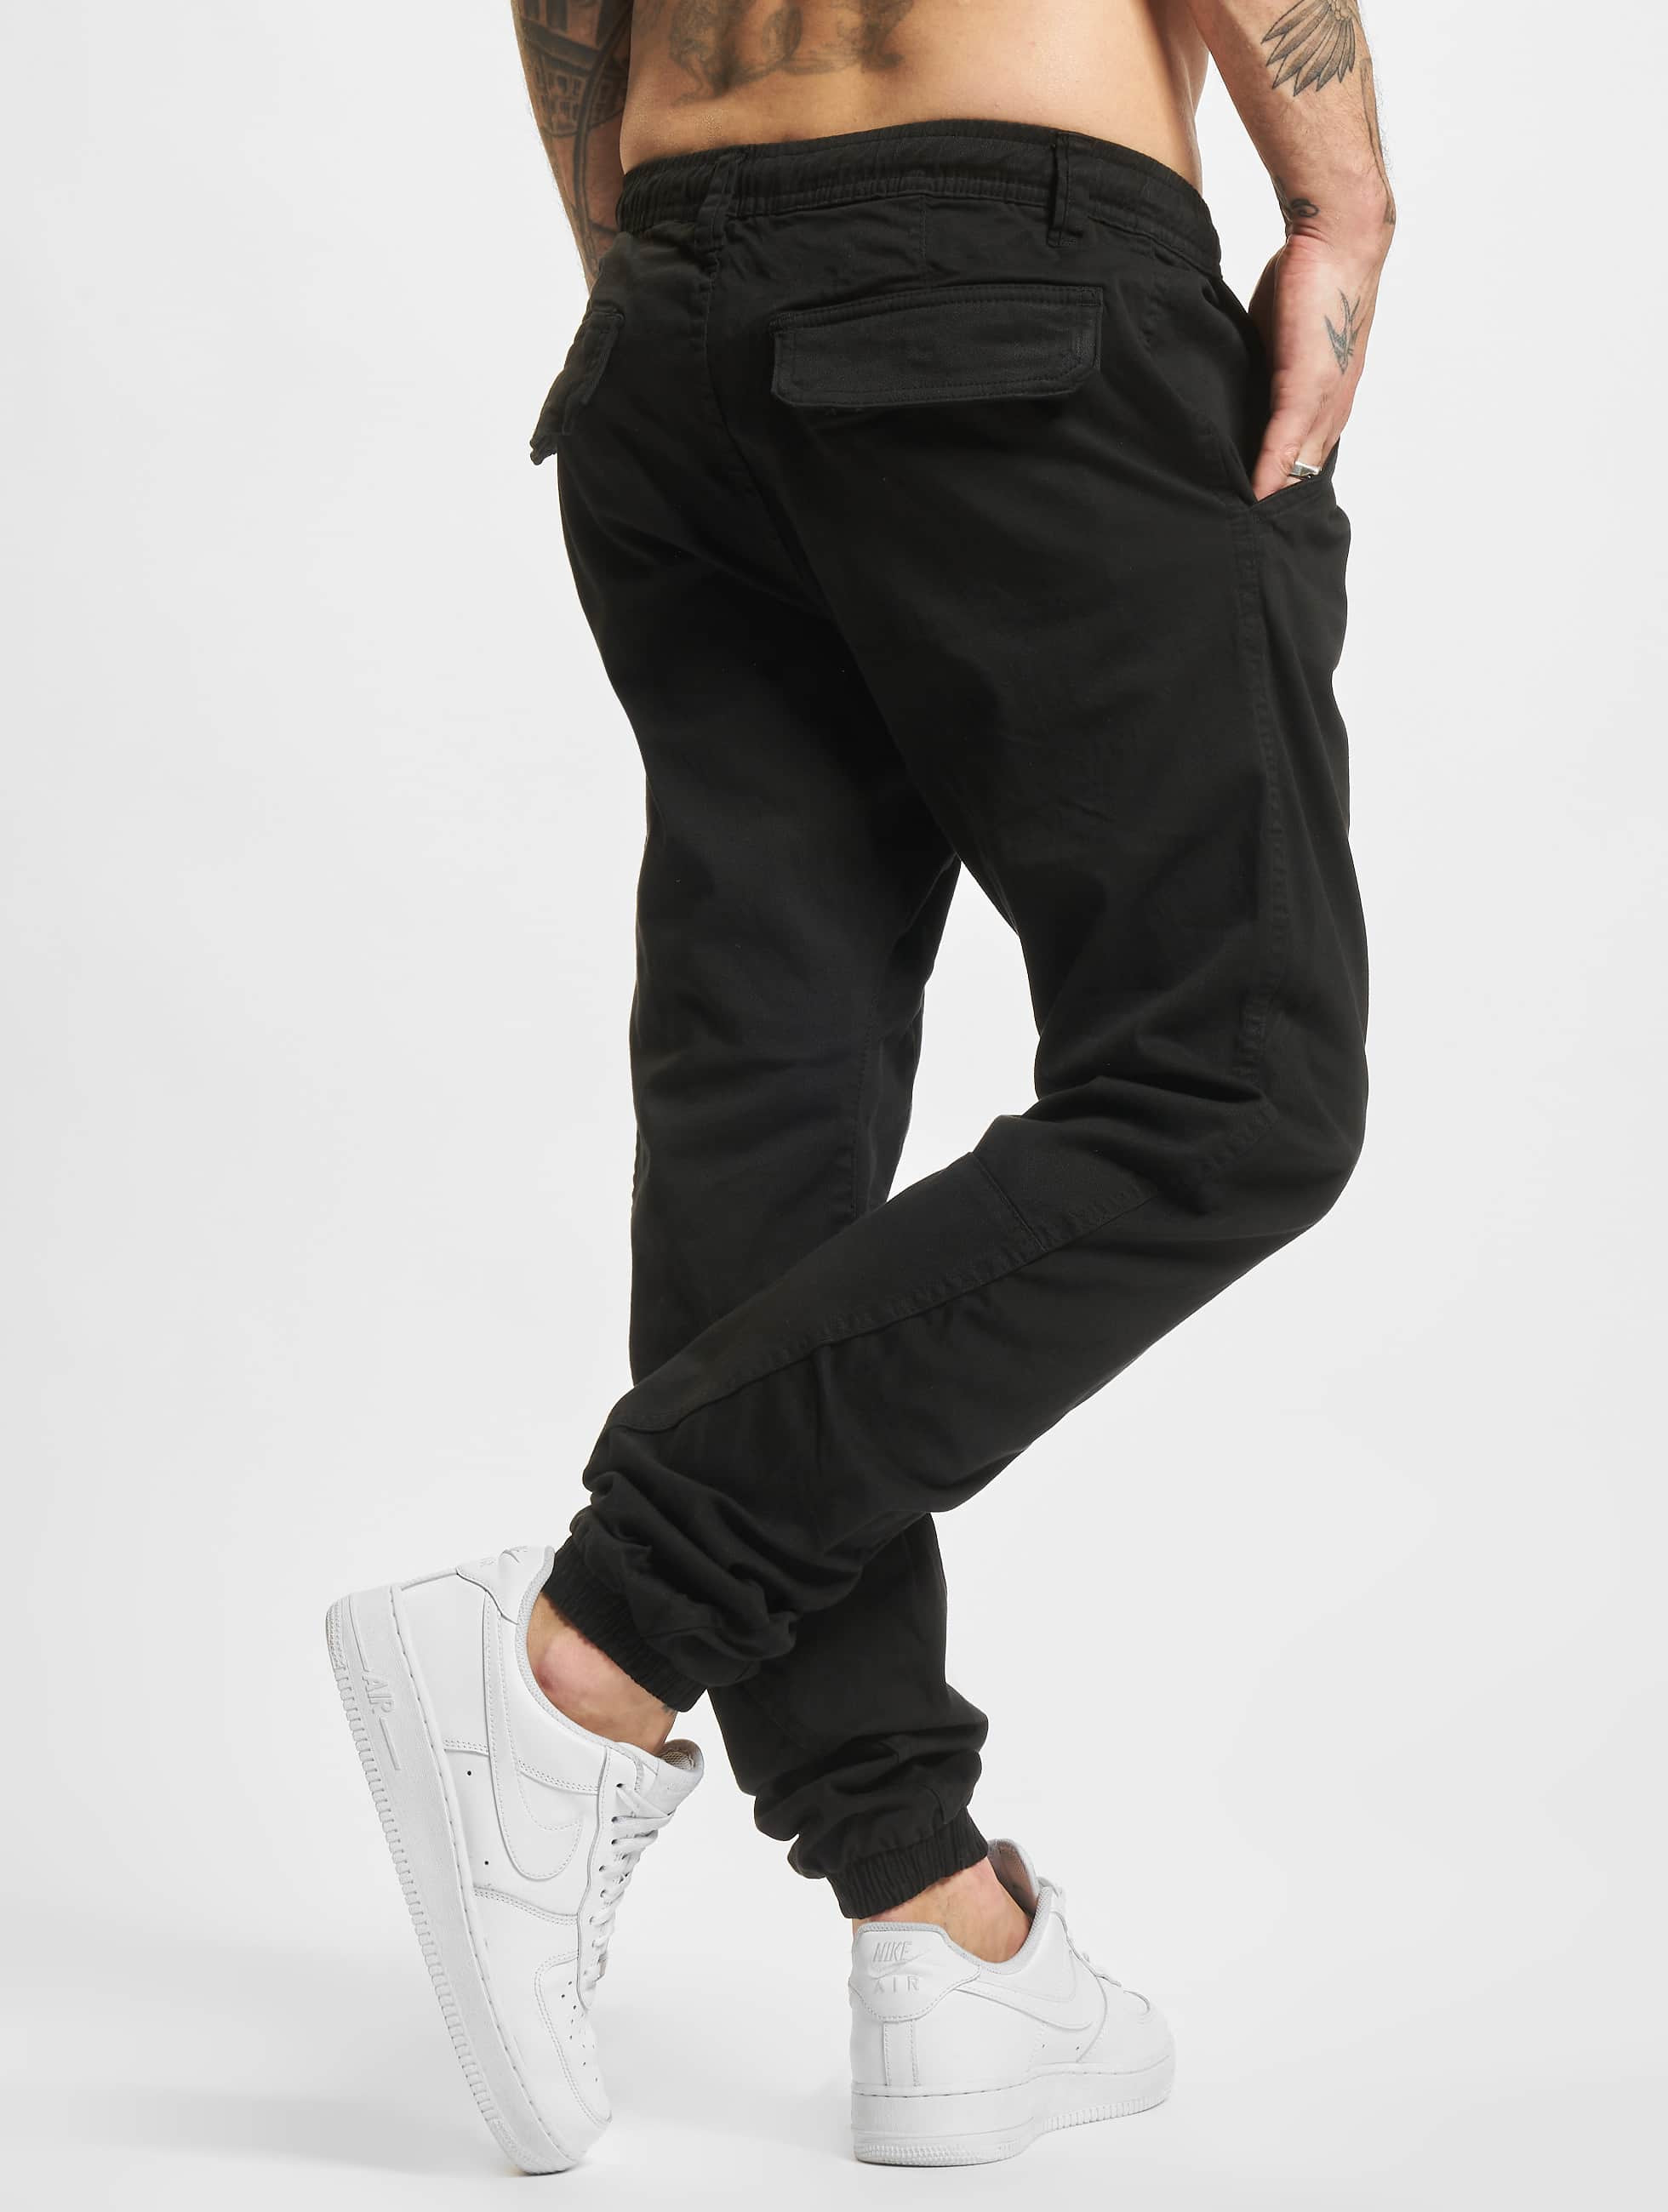 Urban Classics joggingbroek Stretch zwart